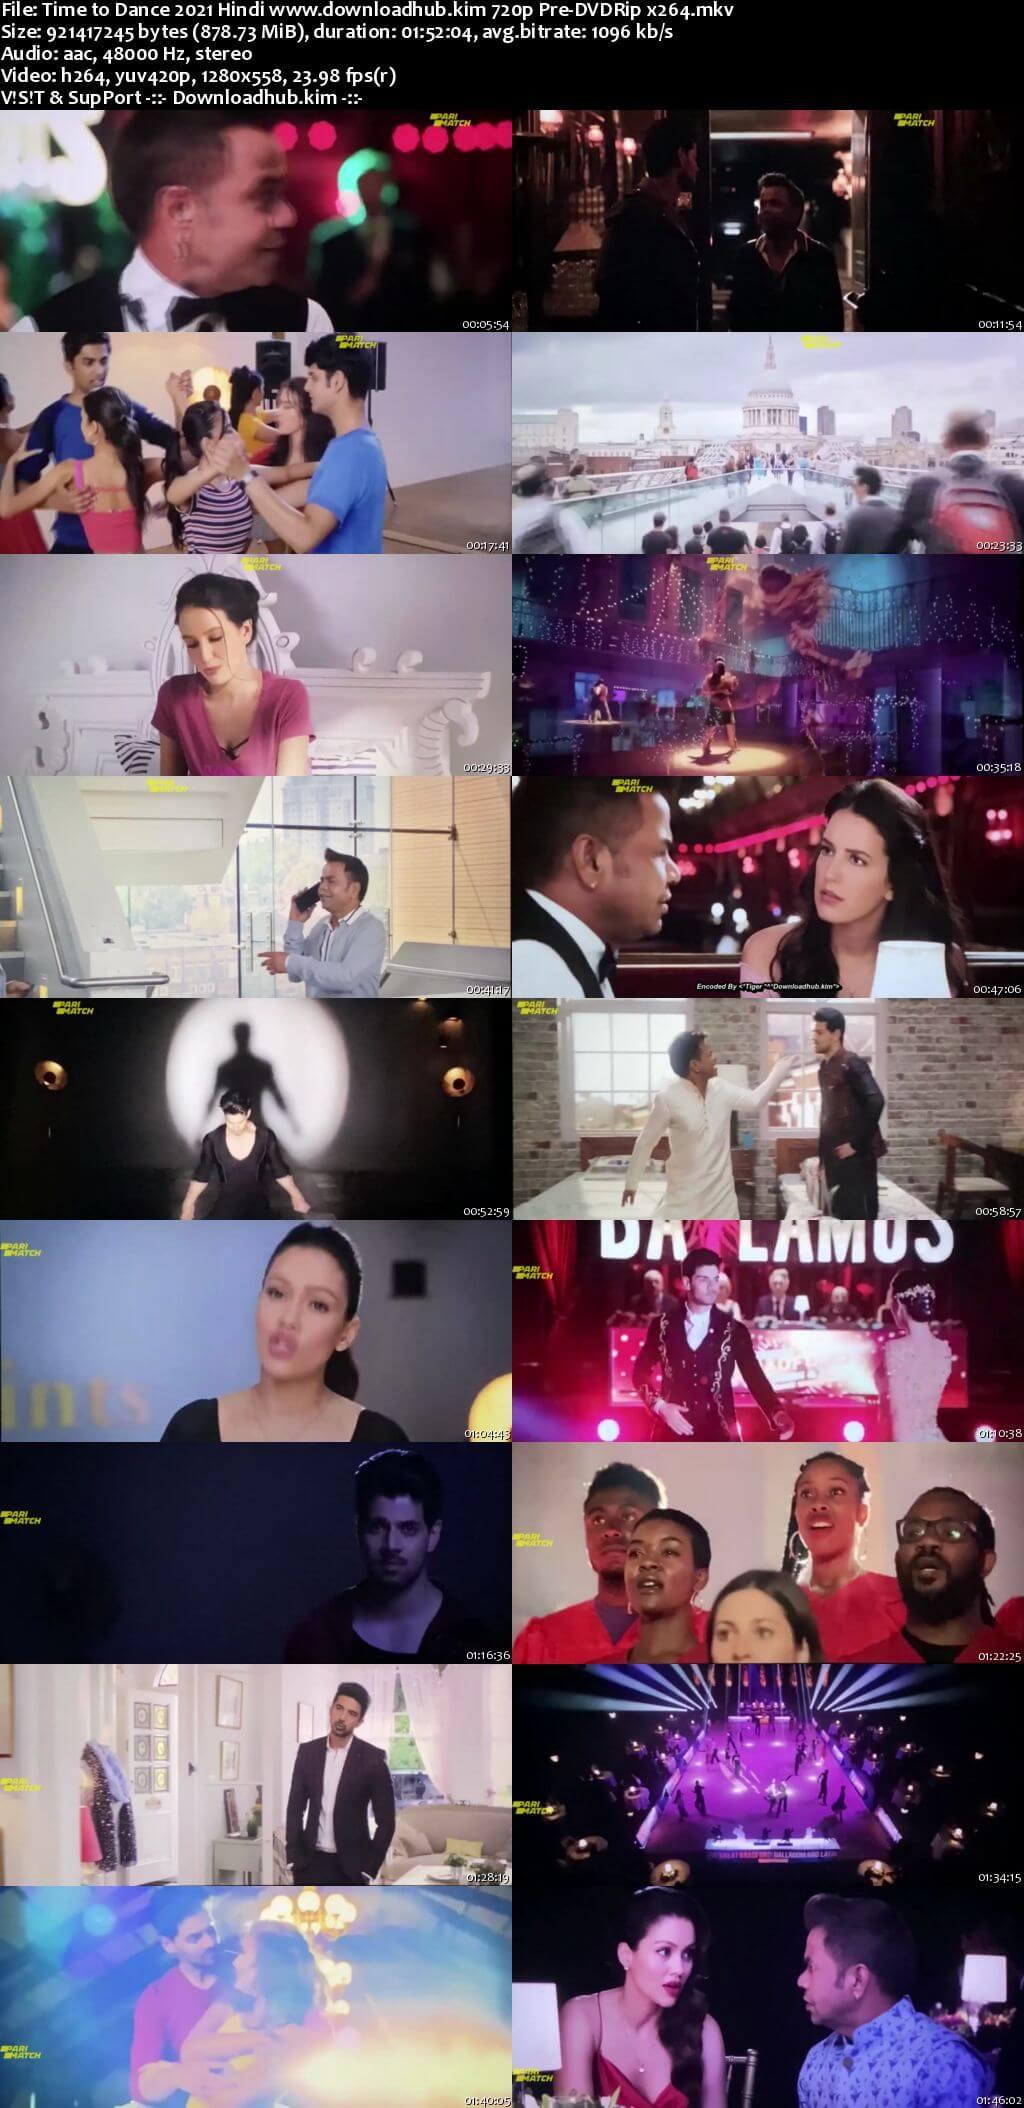 Time to Dance 2021 Hindi 720p 480p Pre-DVDRip x264